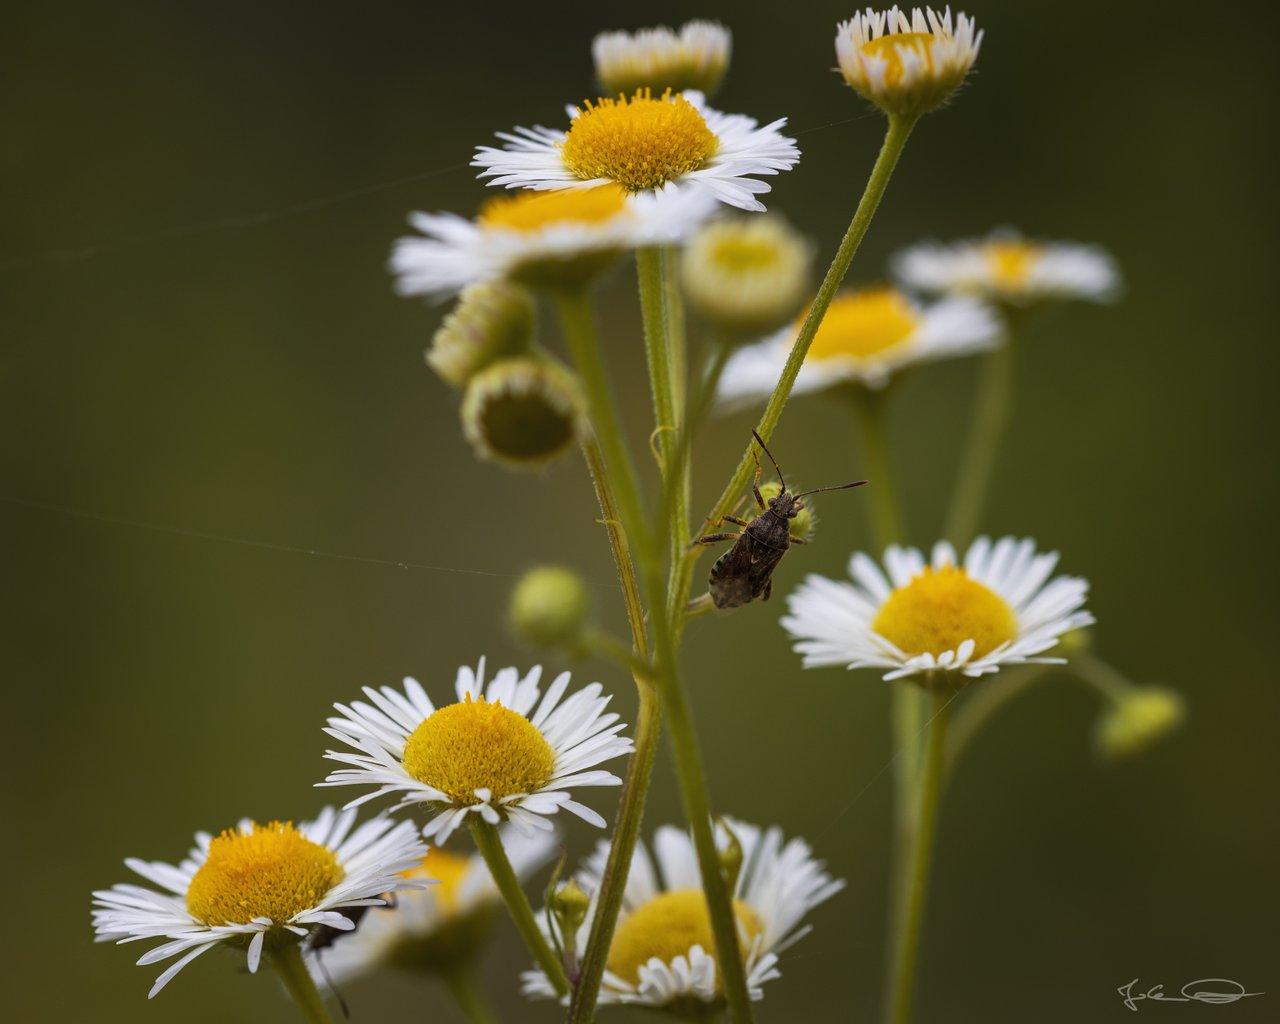 Hive AlphabetHunt Lygaeidae